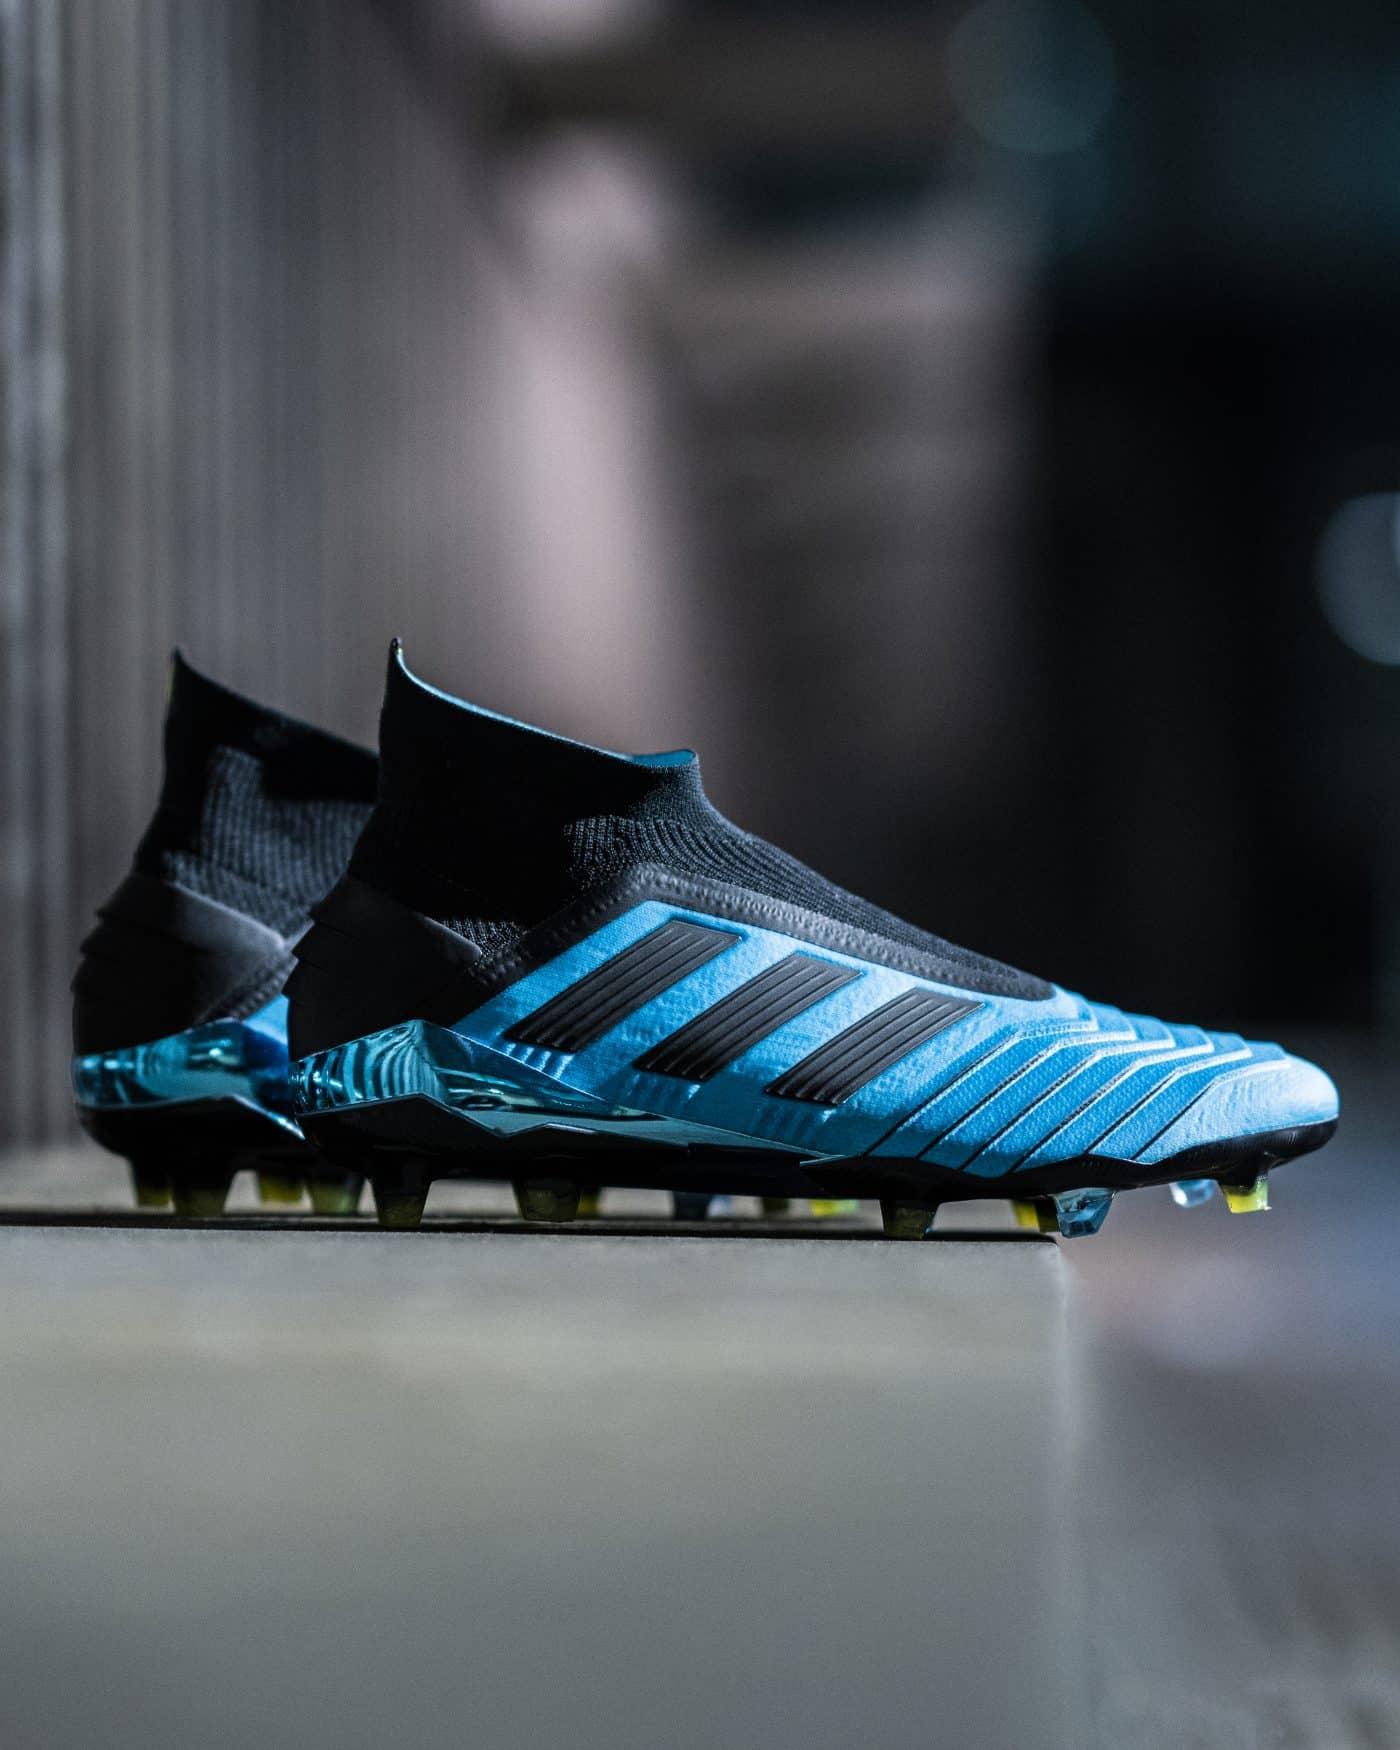 adidas-predator-19-pack-hard-wired-juillet-2019-3